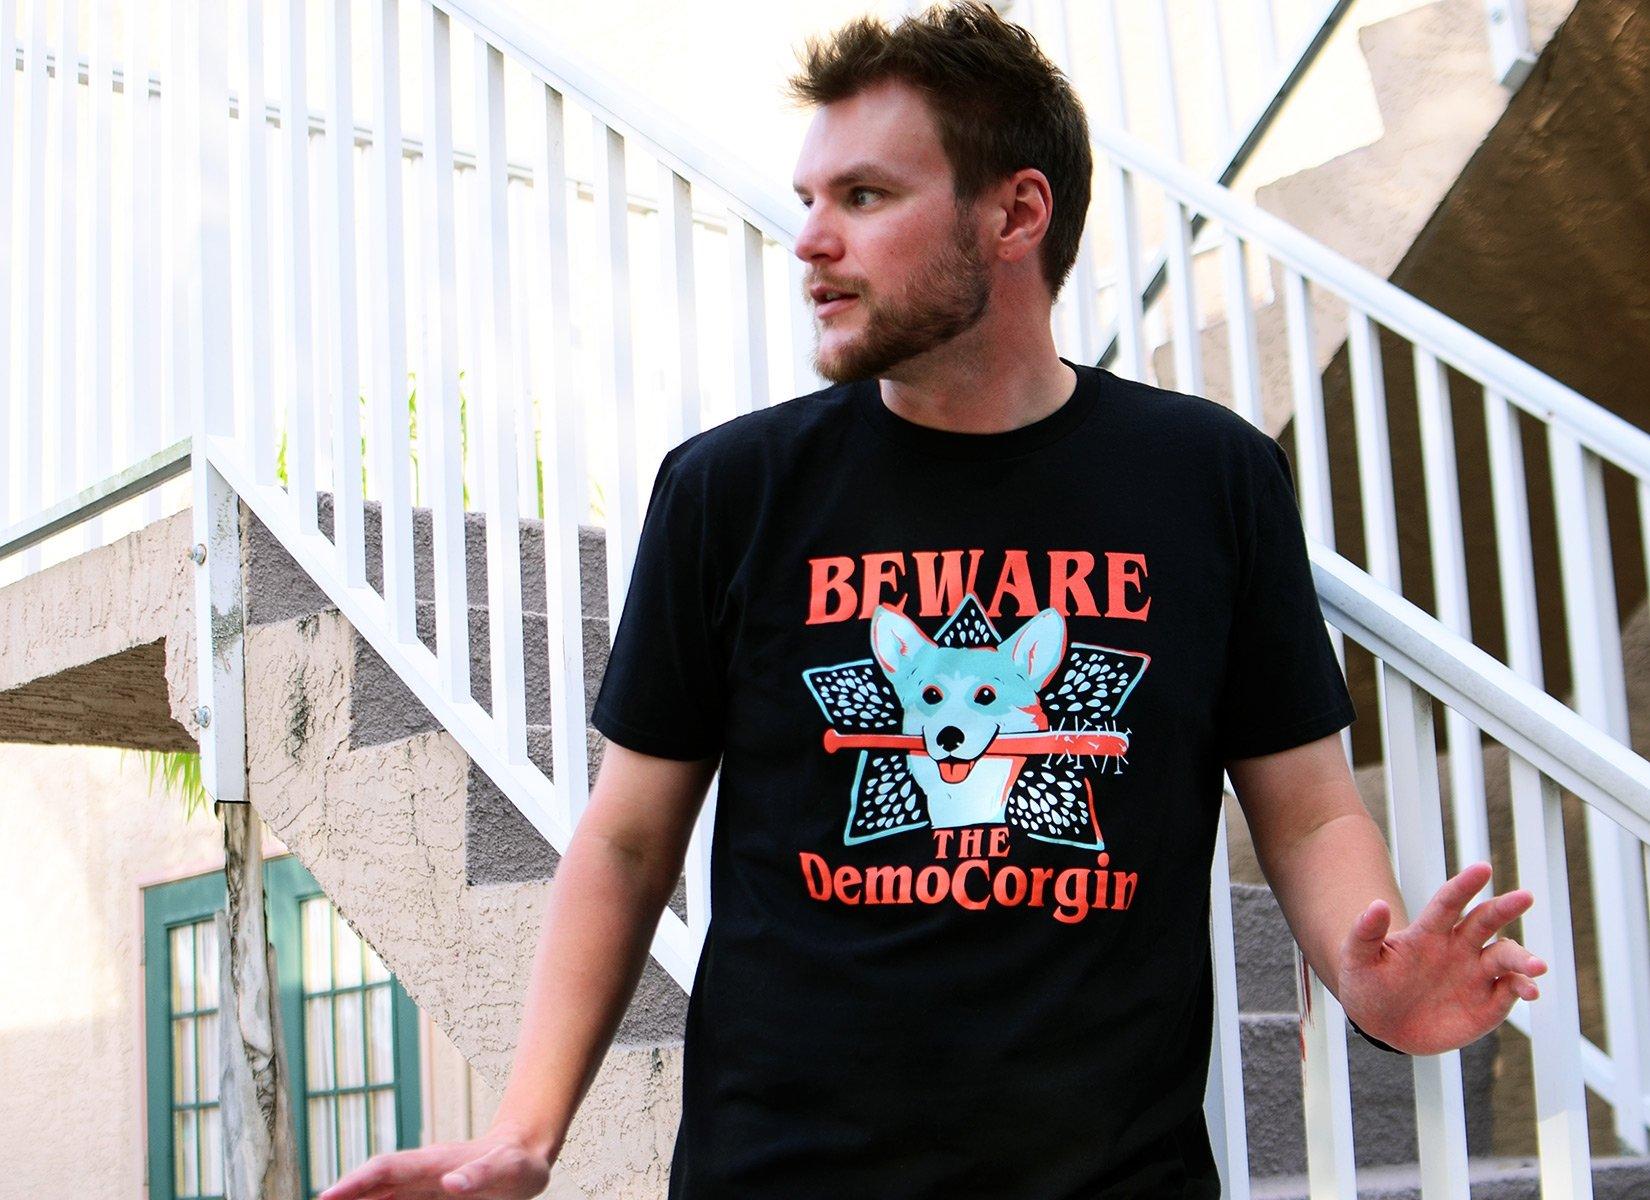 The DemoCorgin